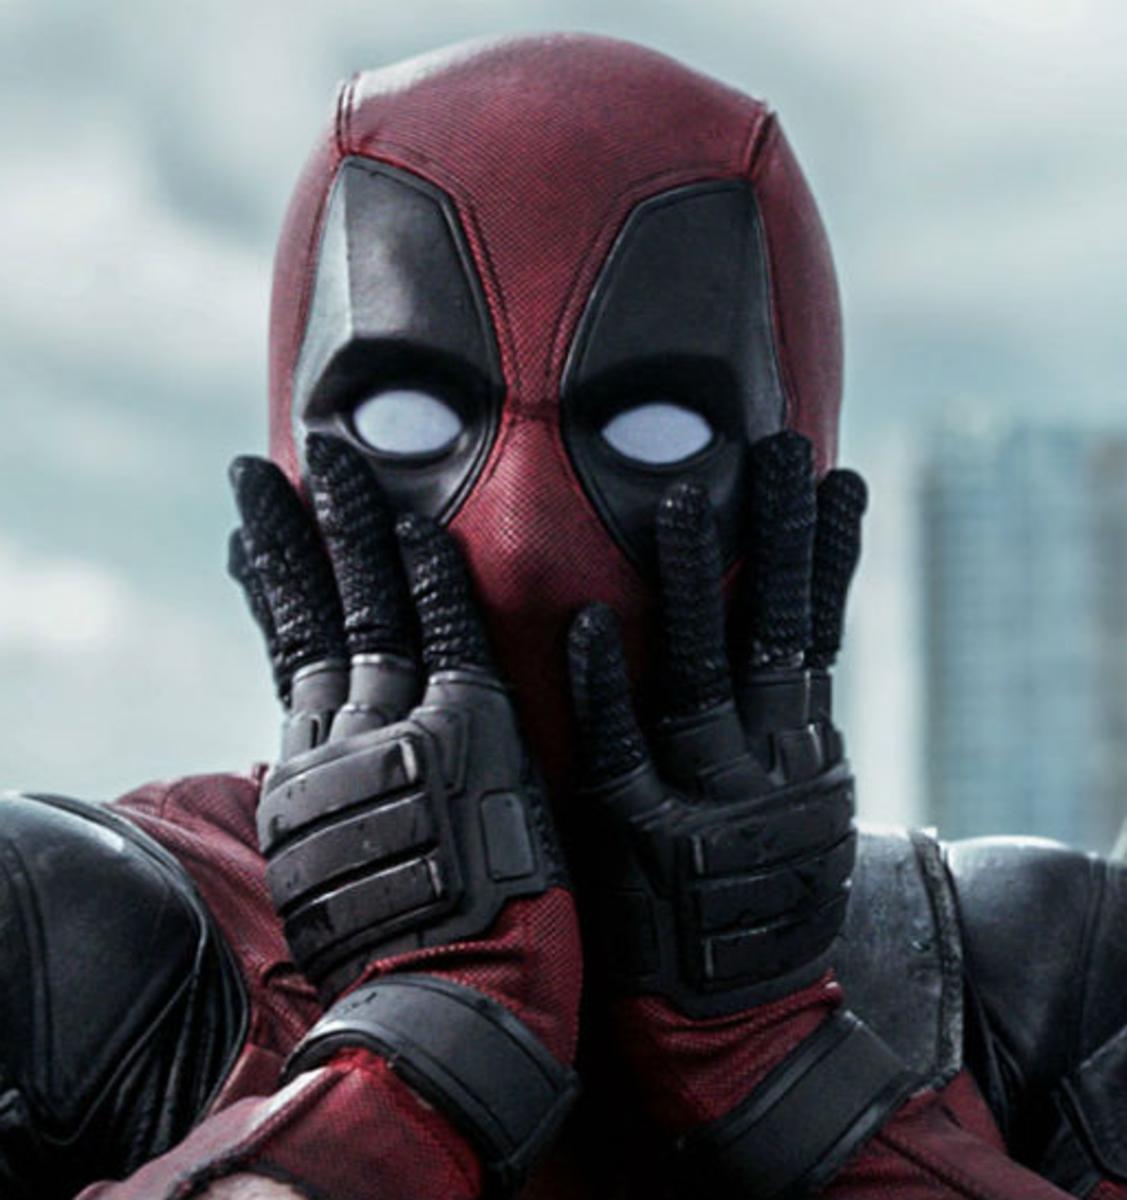 25 Alternative Superhero Movies that Flipped the Genre on its Head